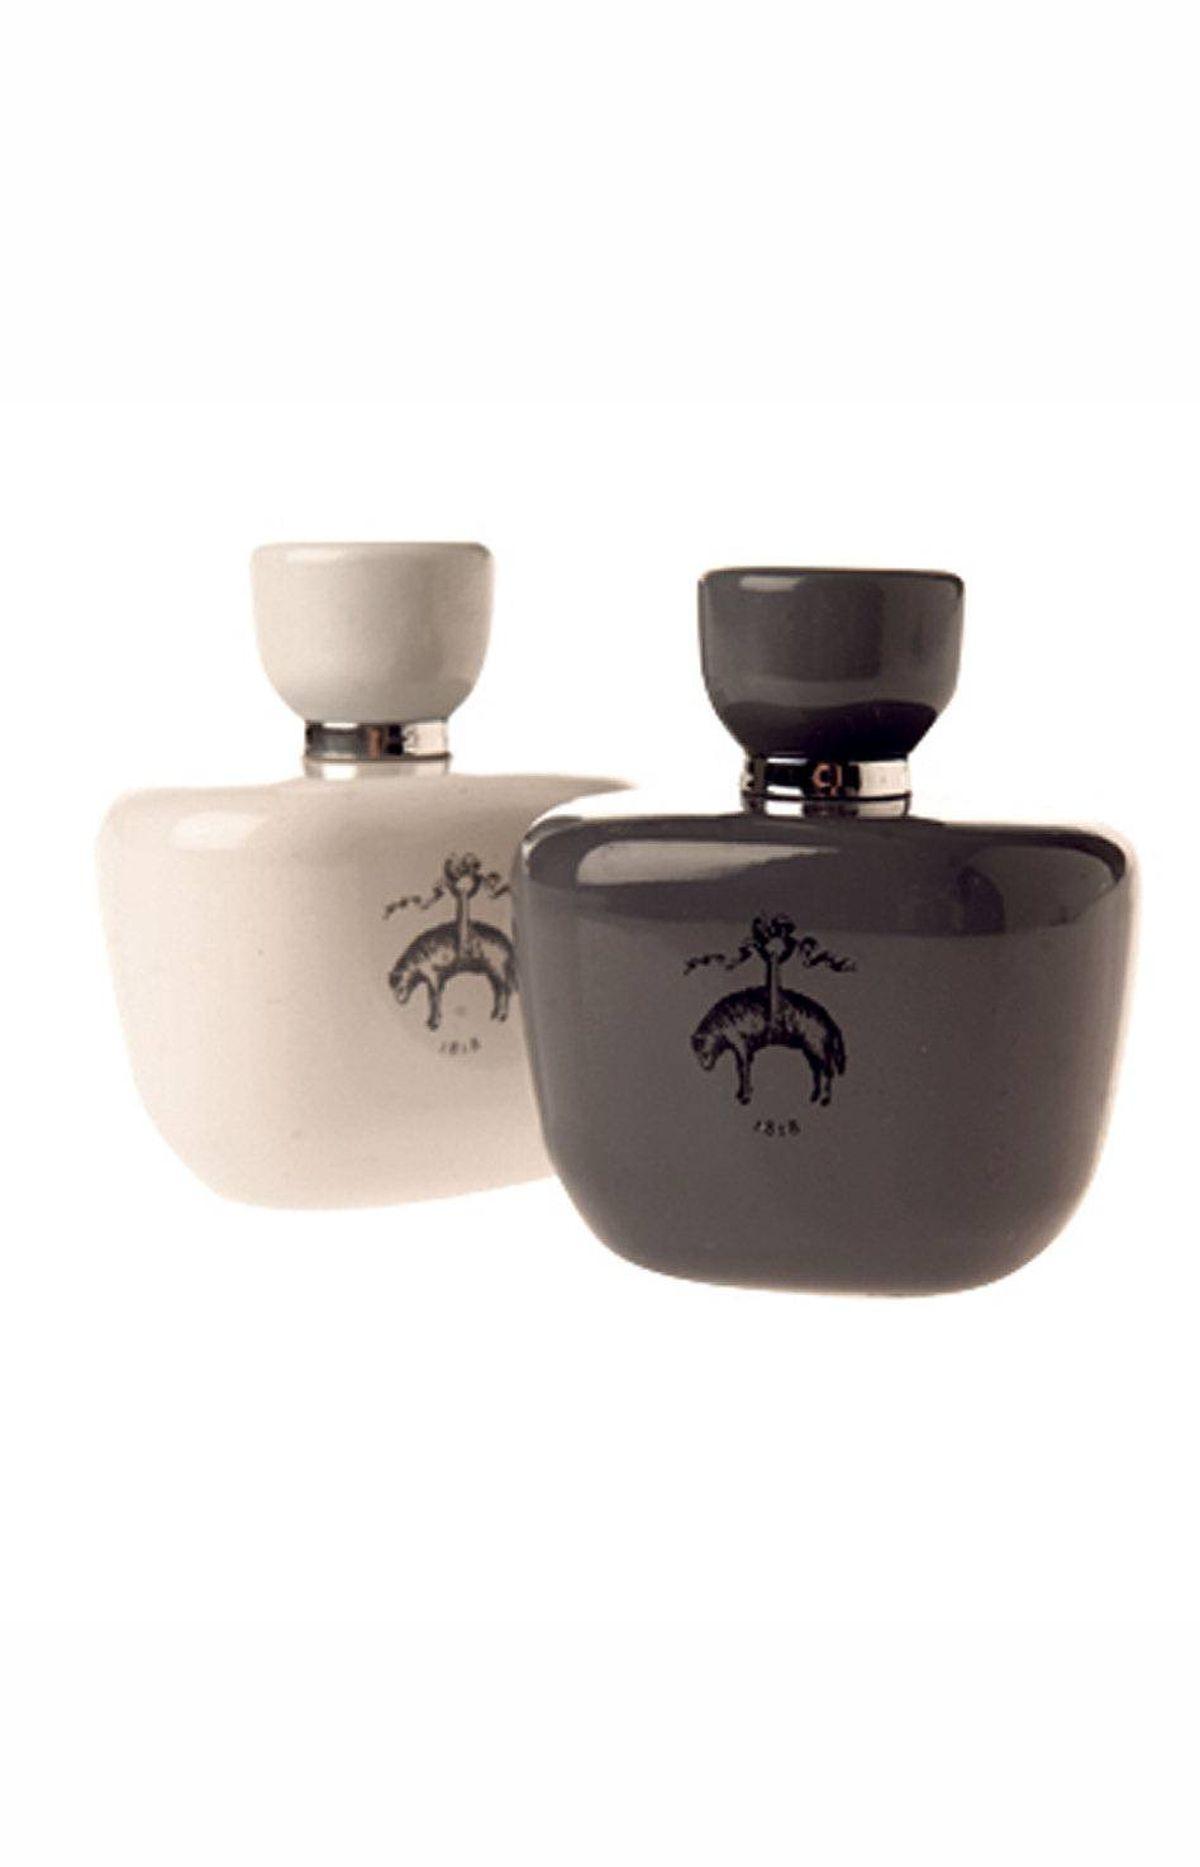 Brooks Brothers Black Fleece eau de toilette, $125 through www.brooksbrothers.com.